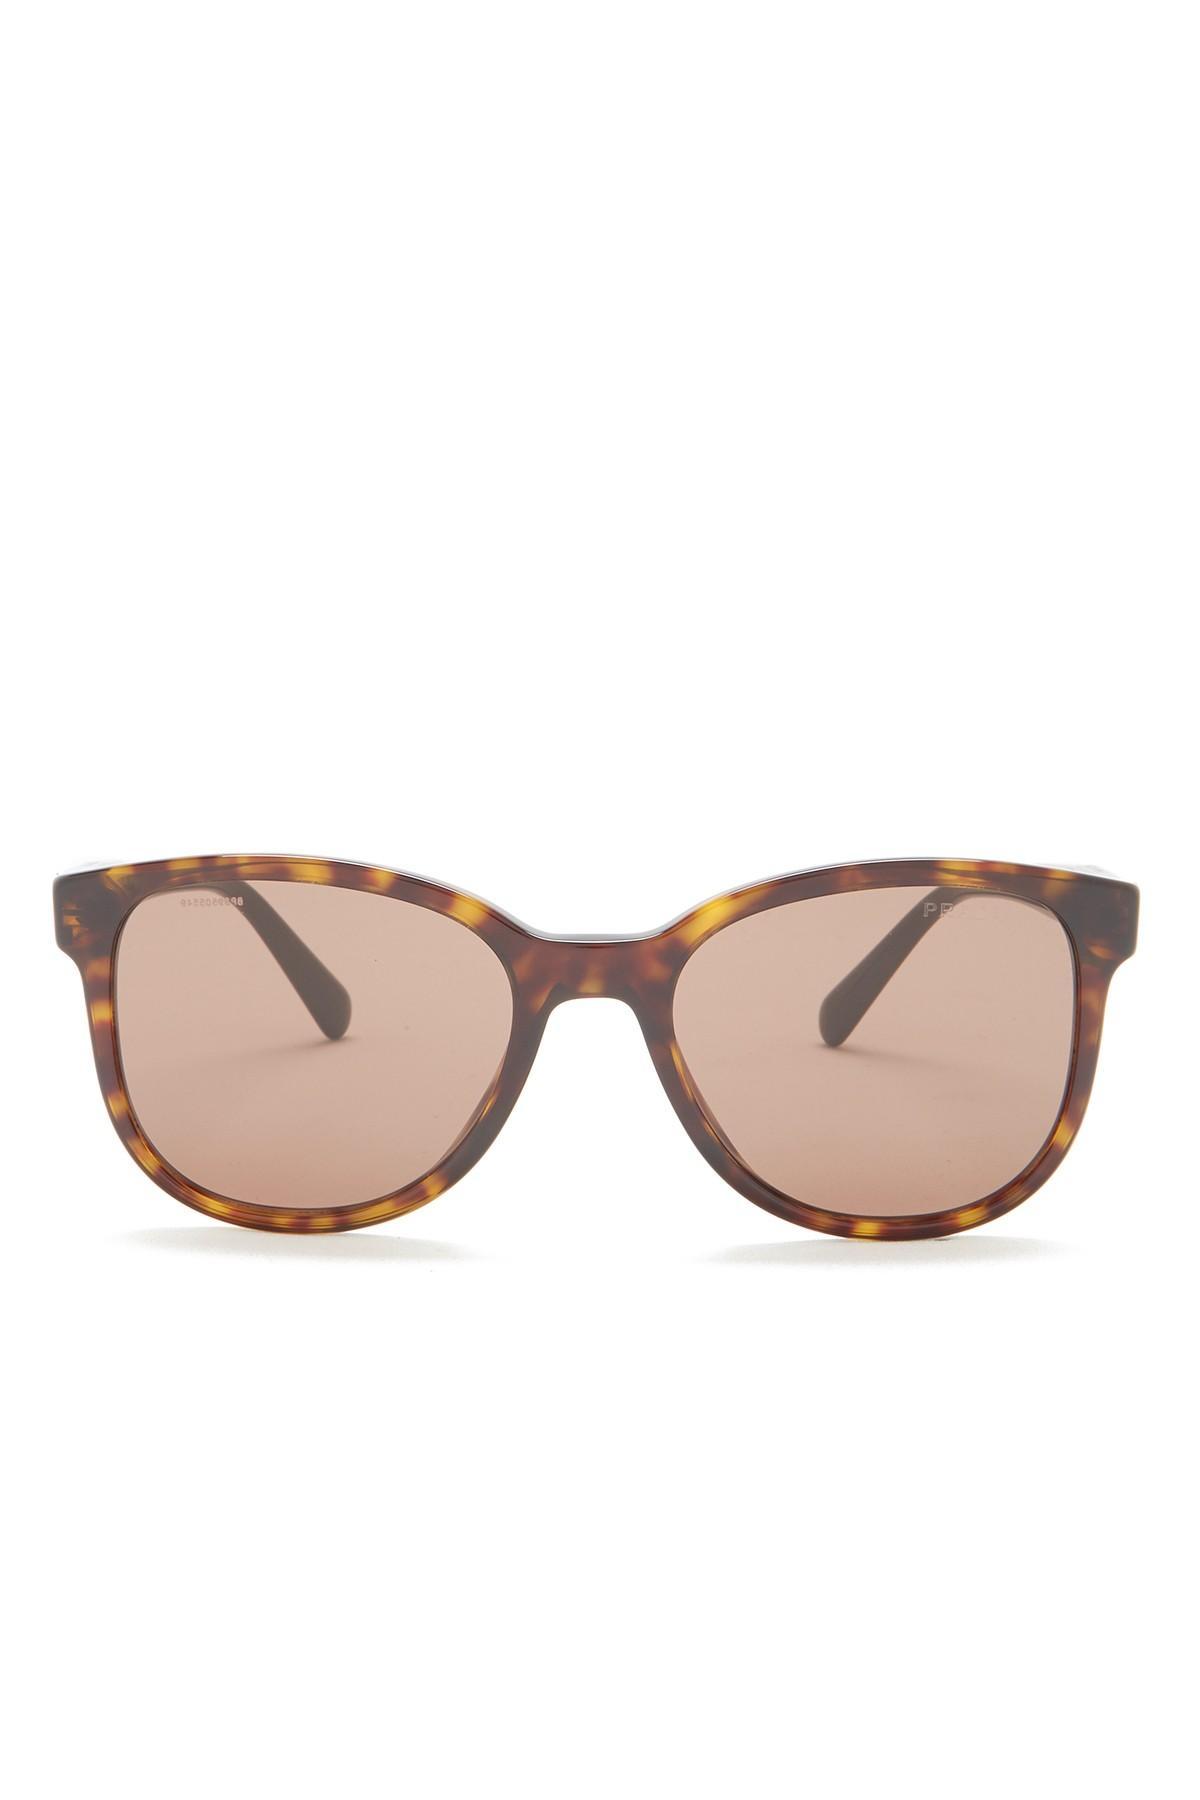 8ee6446aa5 Lyst - Prada 54mm Rectangular Sunglasses in Brown